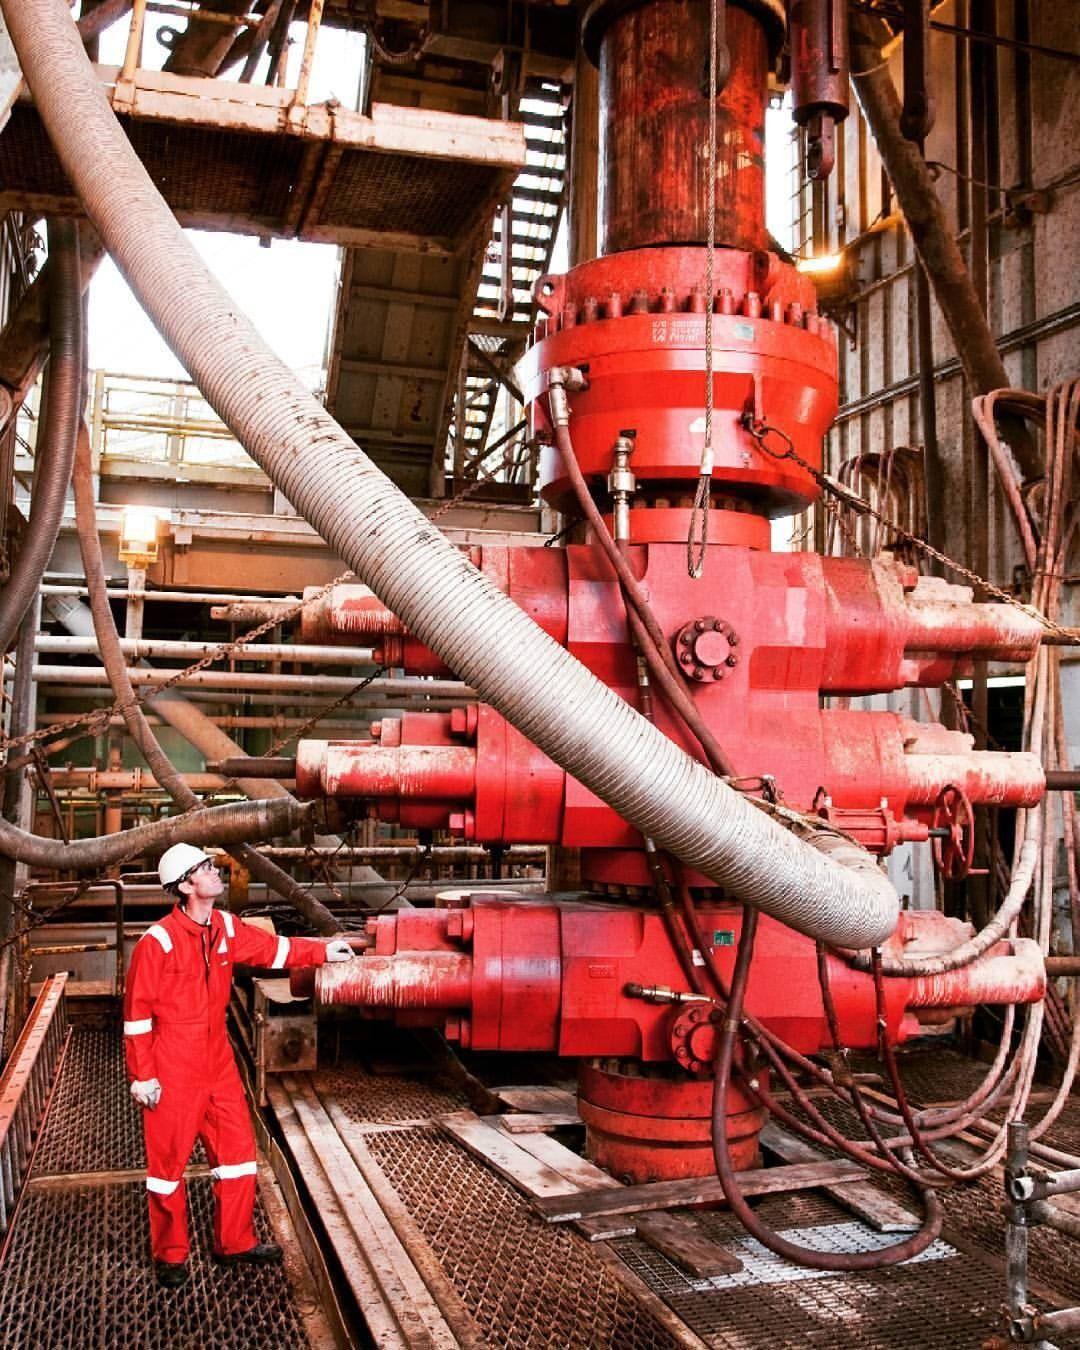 Instagram Photo By Yaribelrb May 10 2016 At 12 06pm Utc Oil Rig Jobs Oil Platform Oilfield